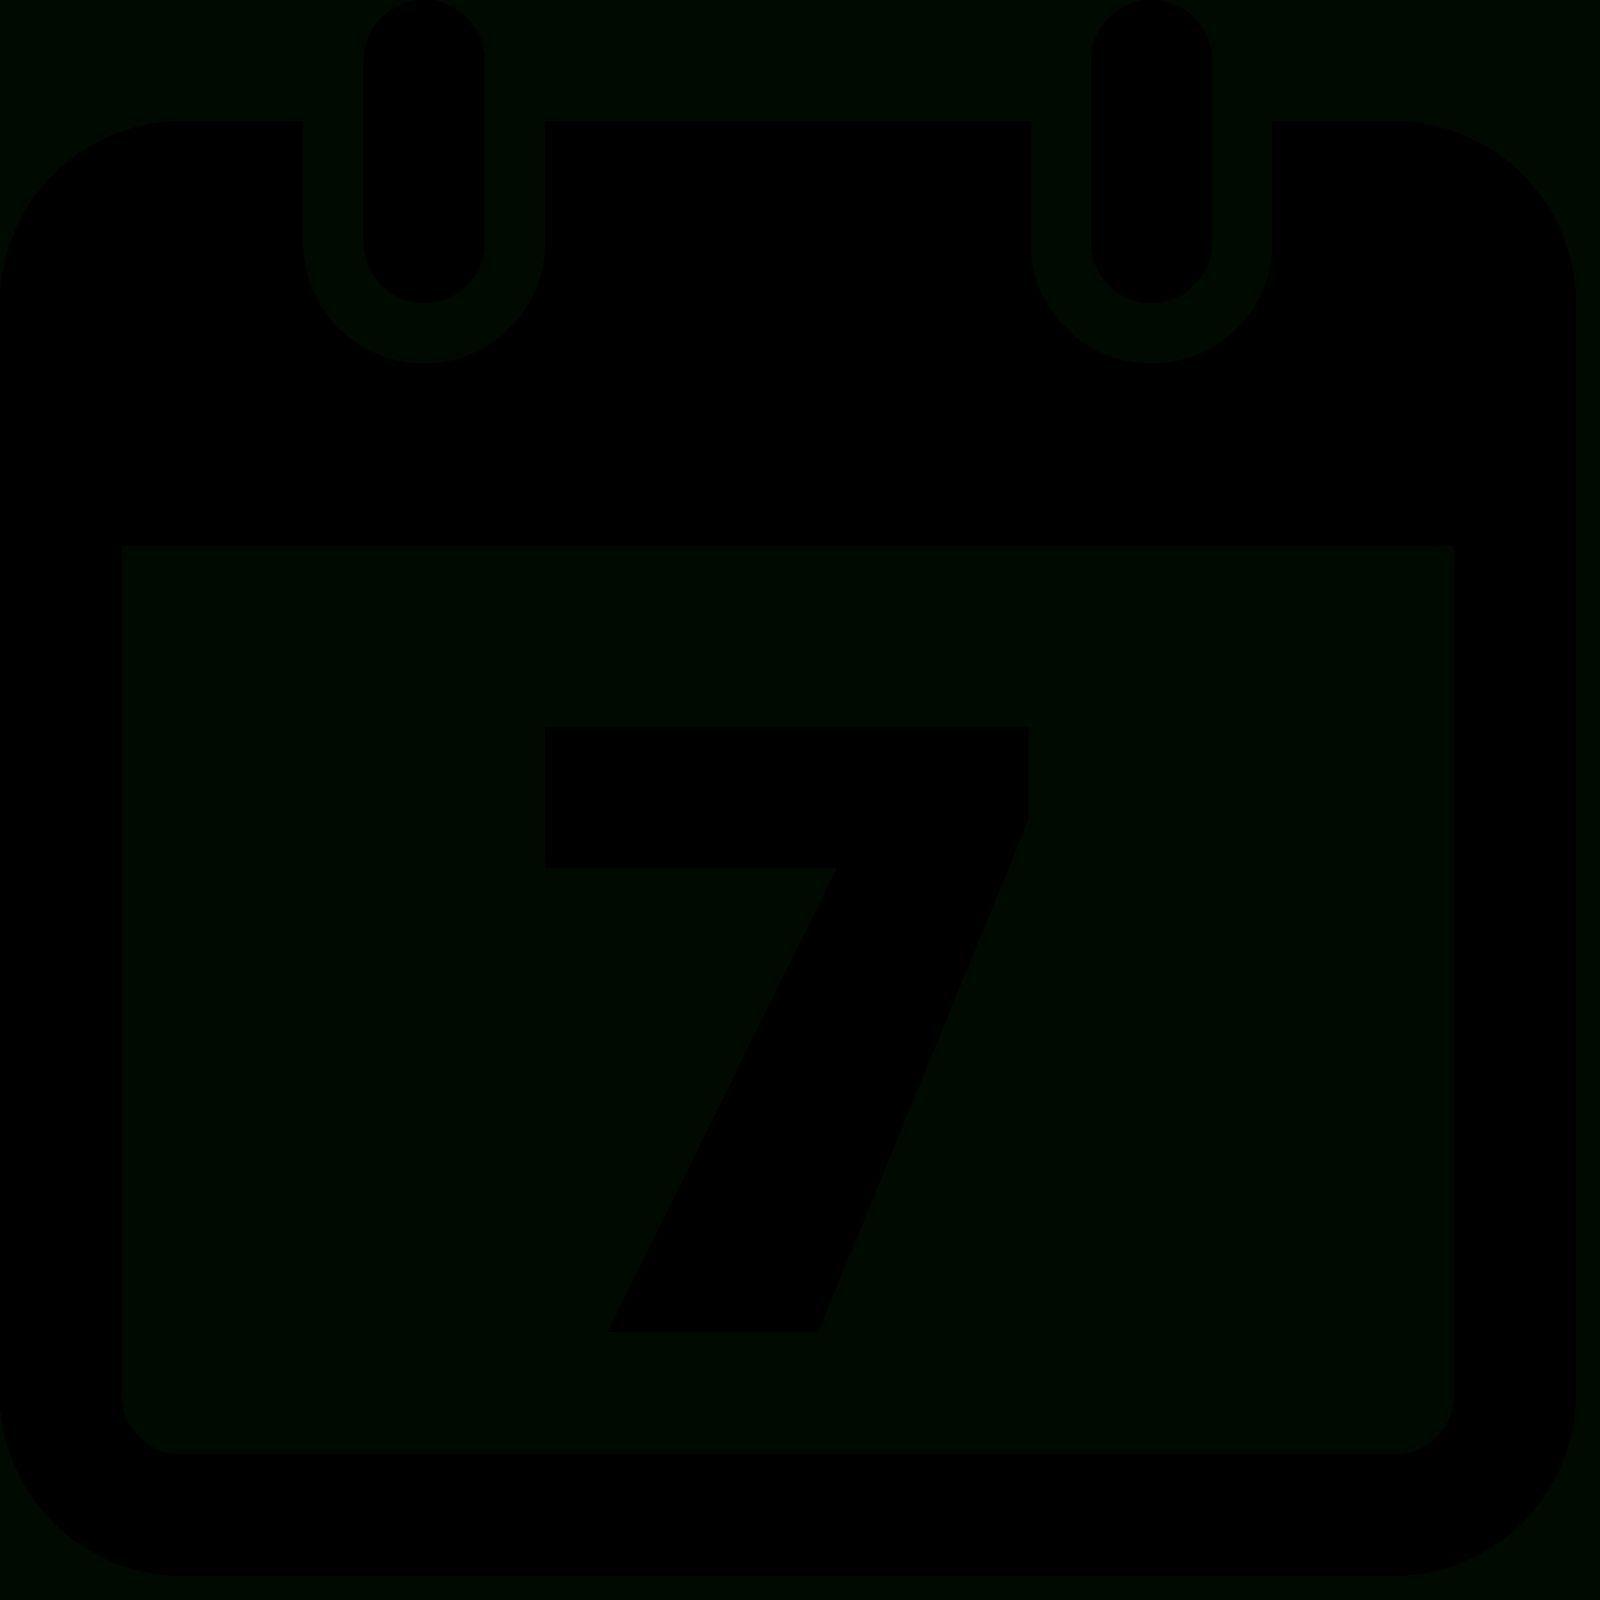 calendar date icon generator in 2020 | calendar icon